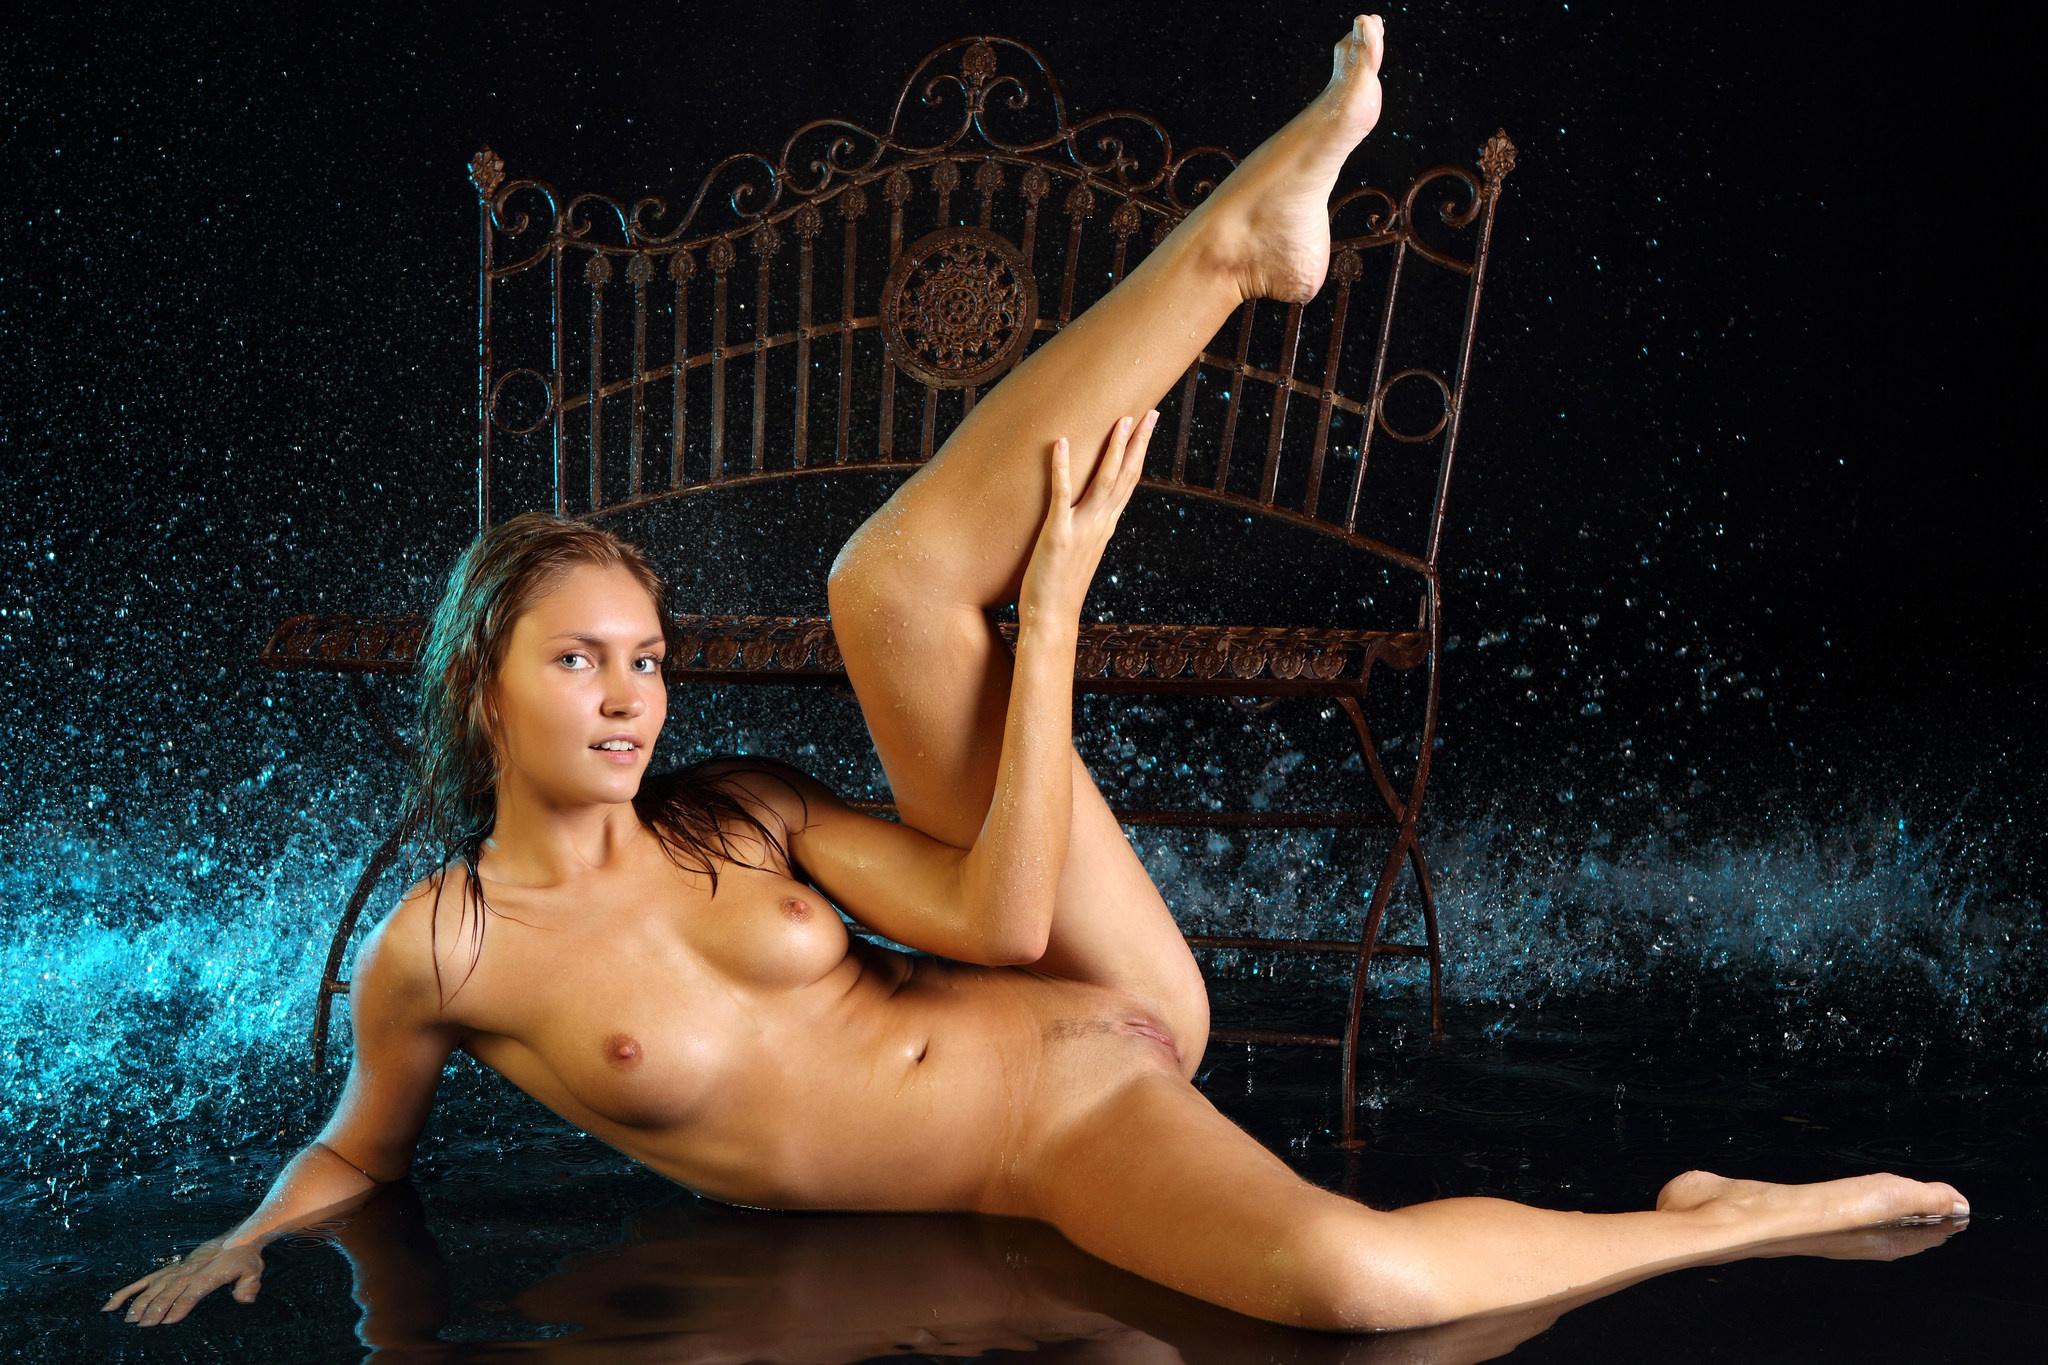 Sexy Women Desktop Wallpaper